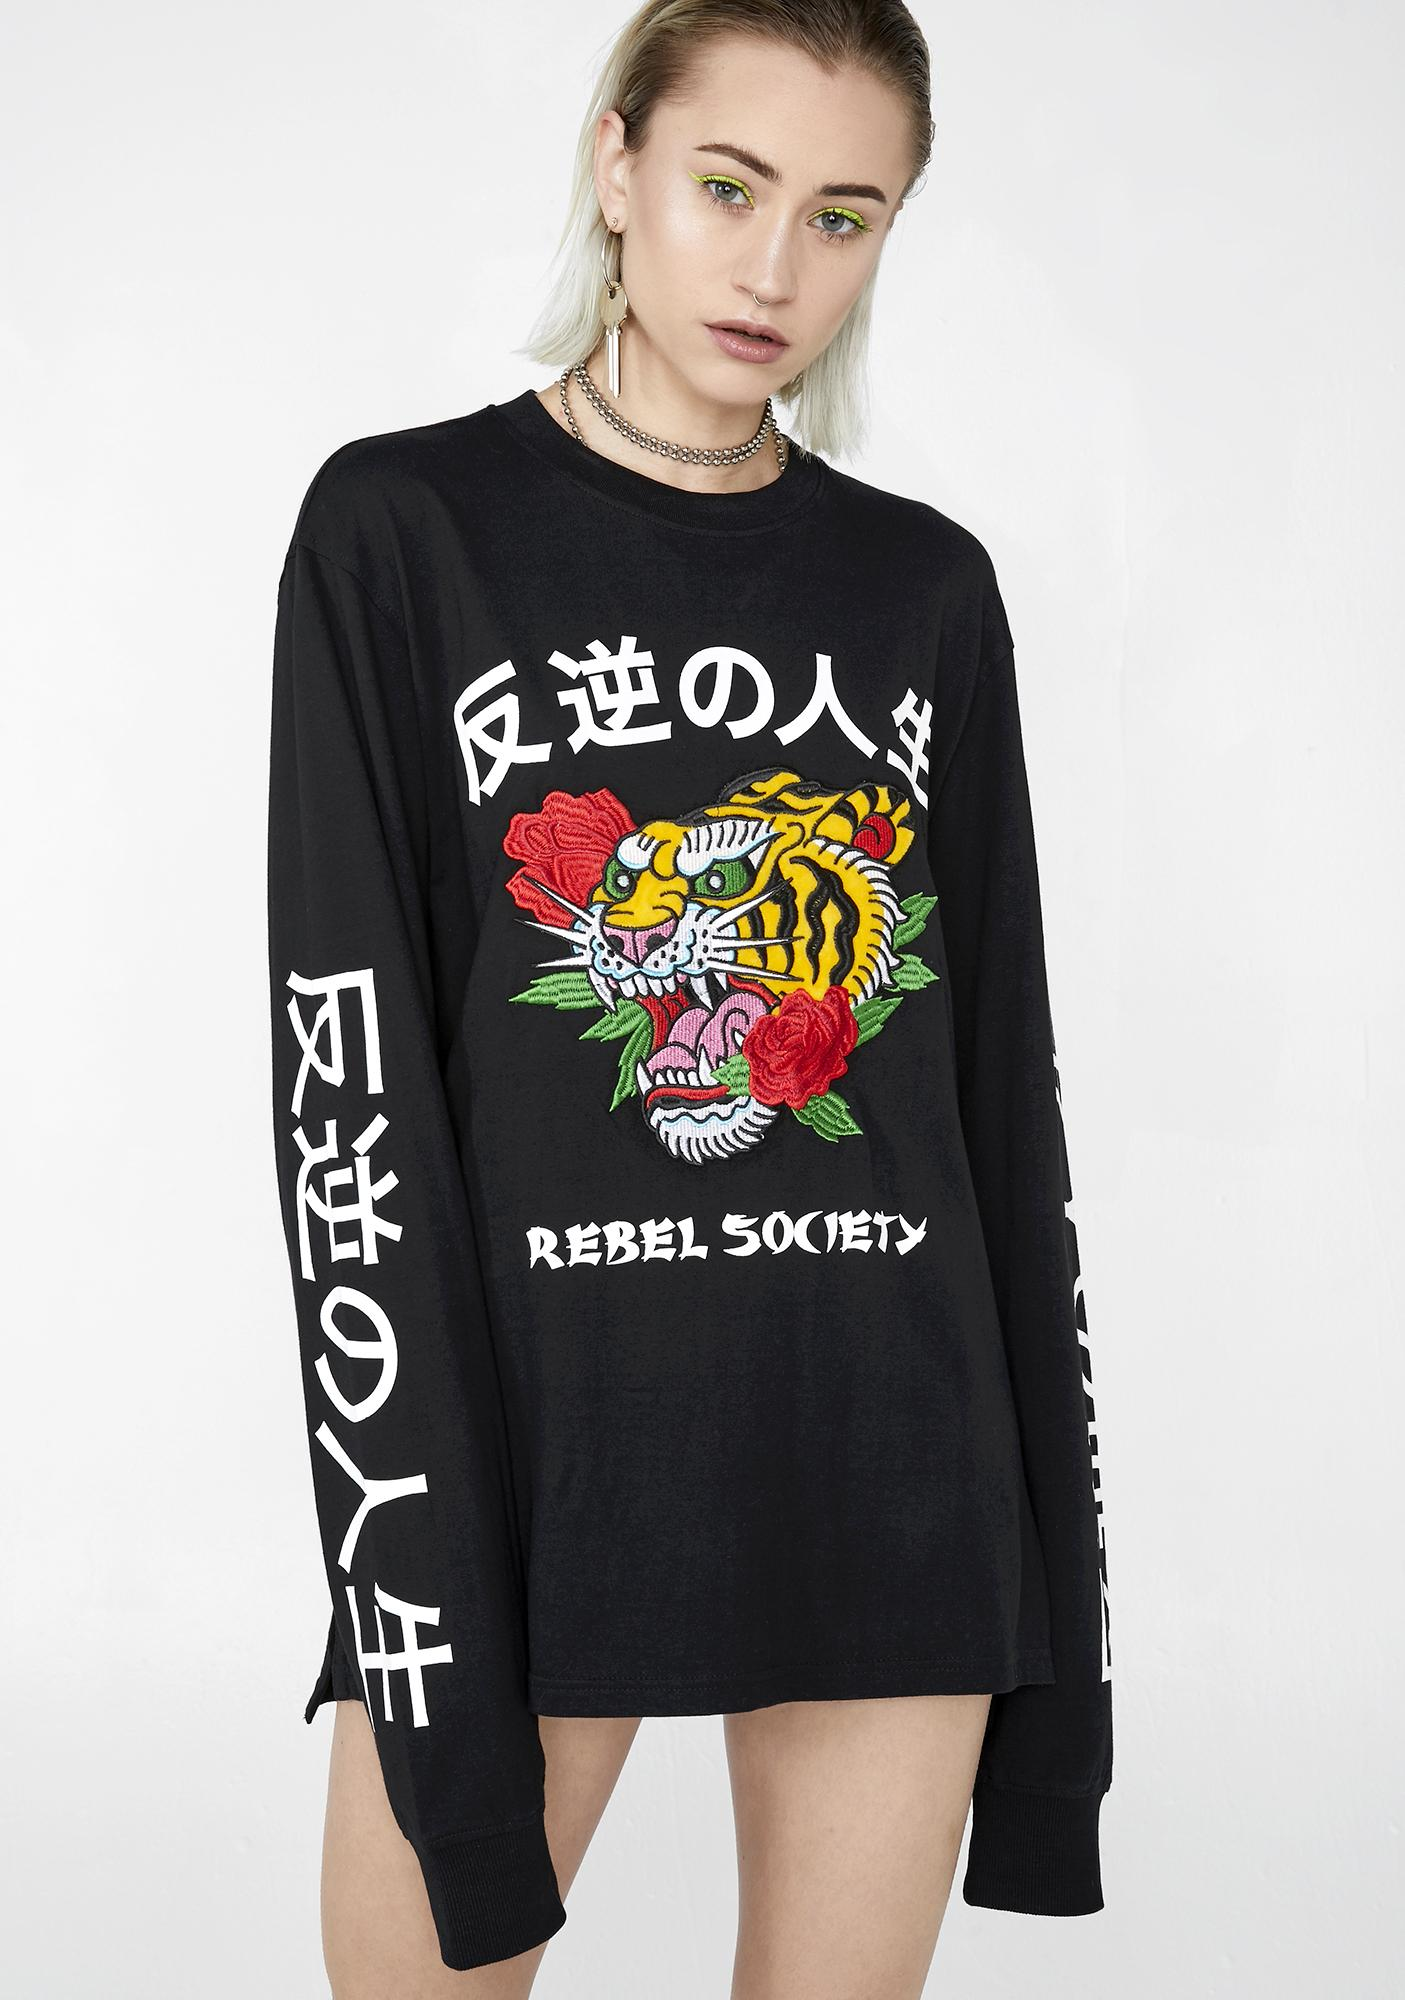 Rebel Society Long Sleeve Top